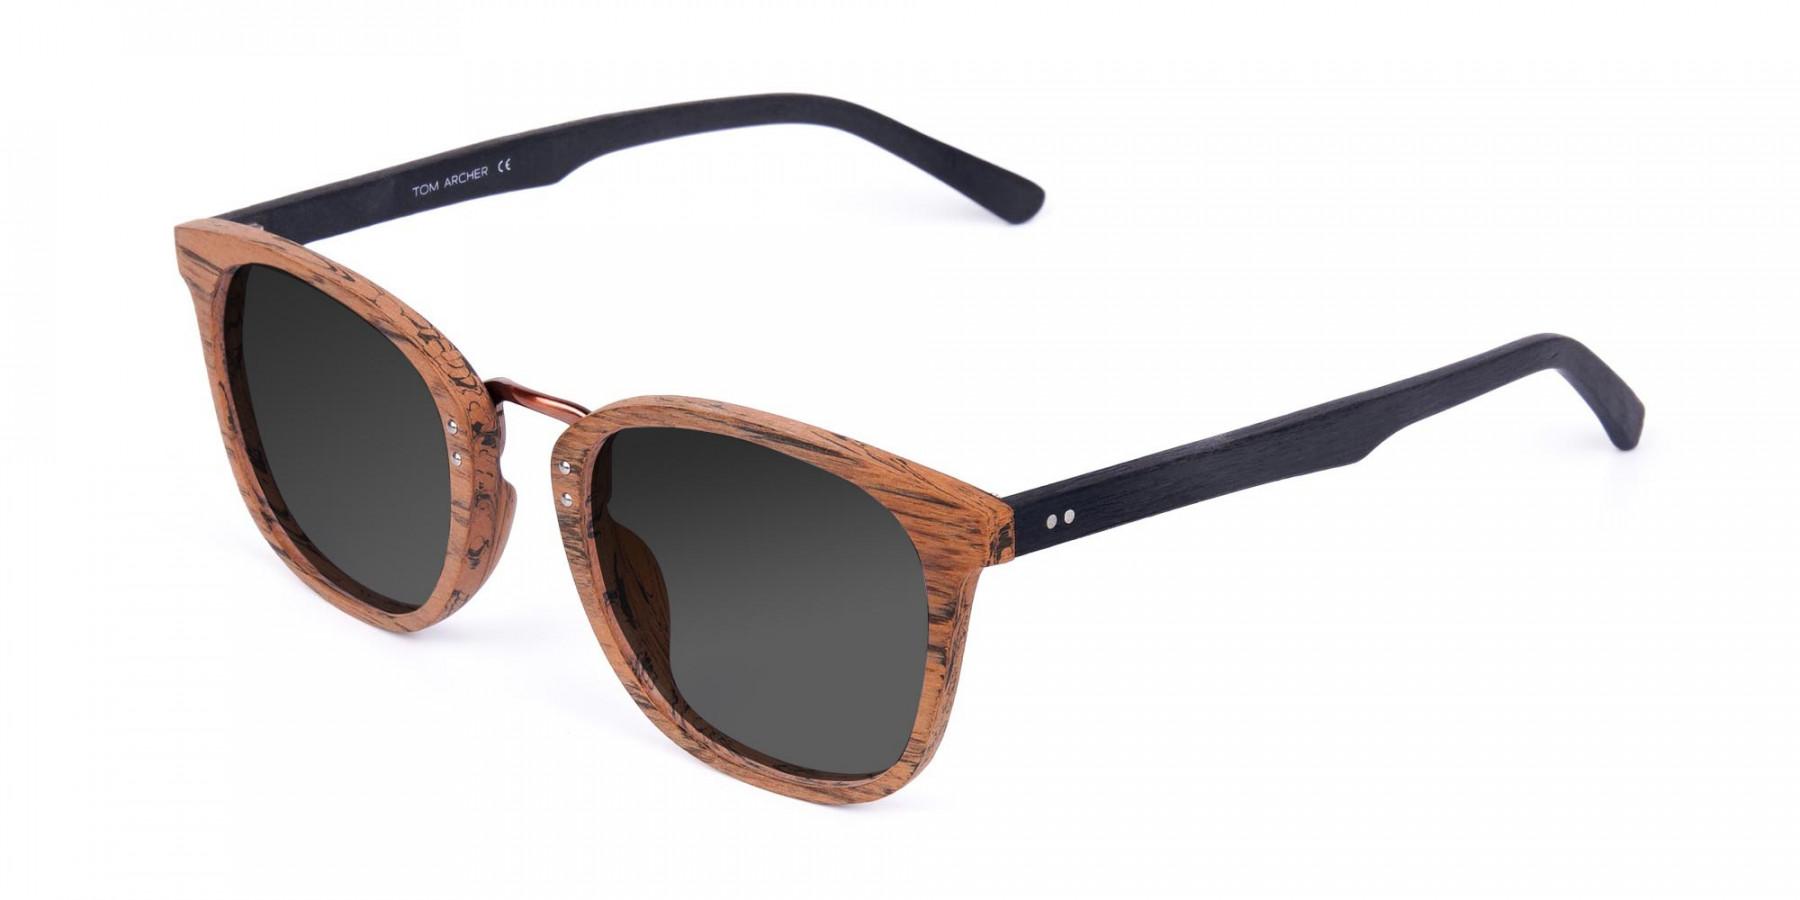 Wooden-Brown-Square-Designer-Sunglasses-3